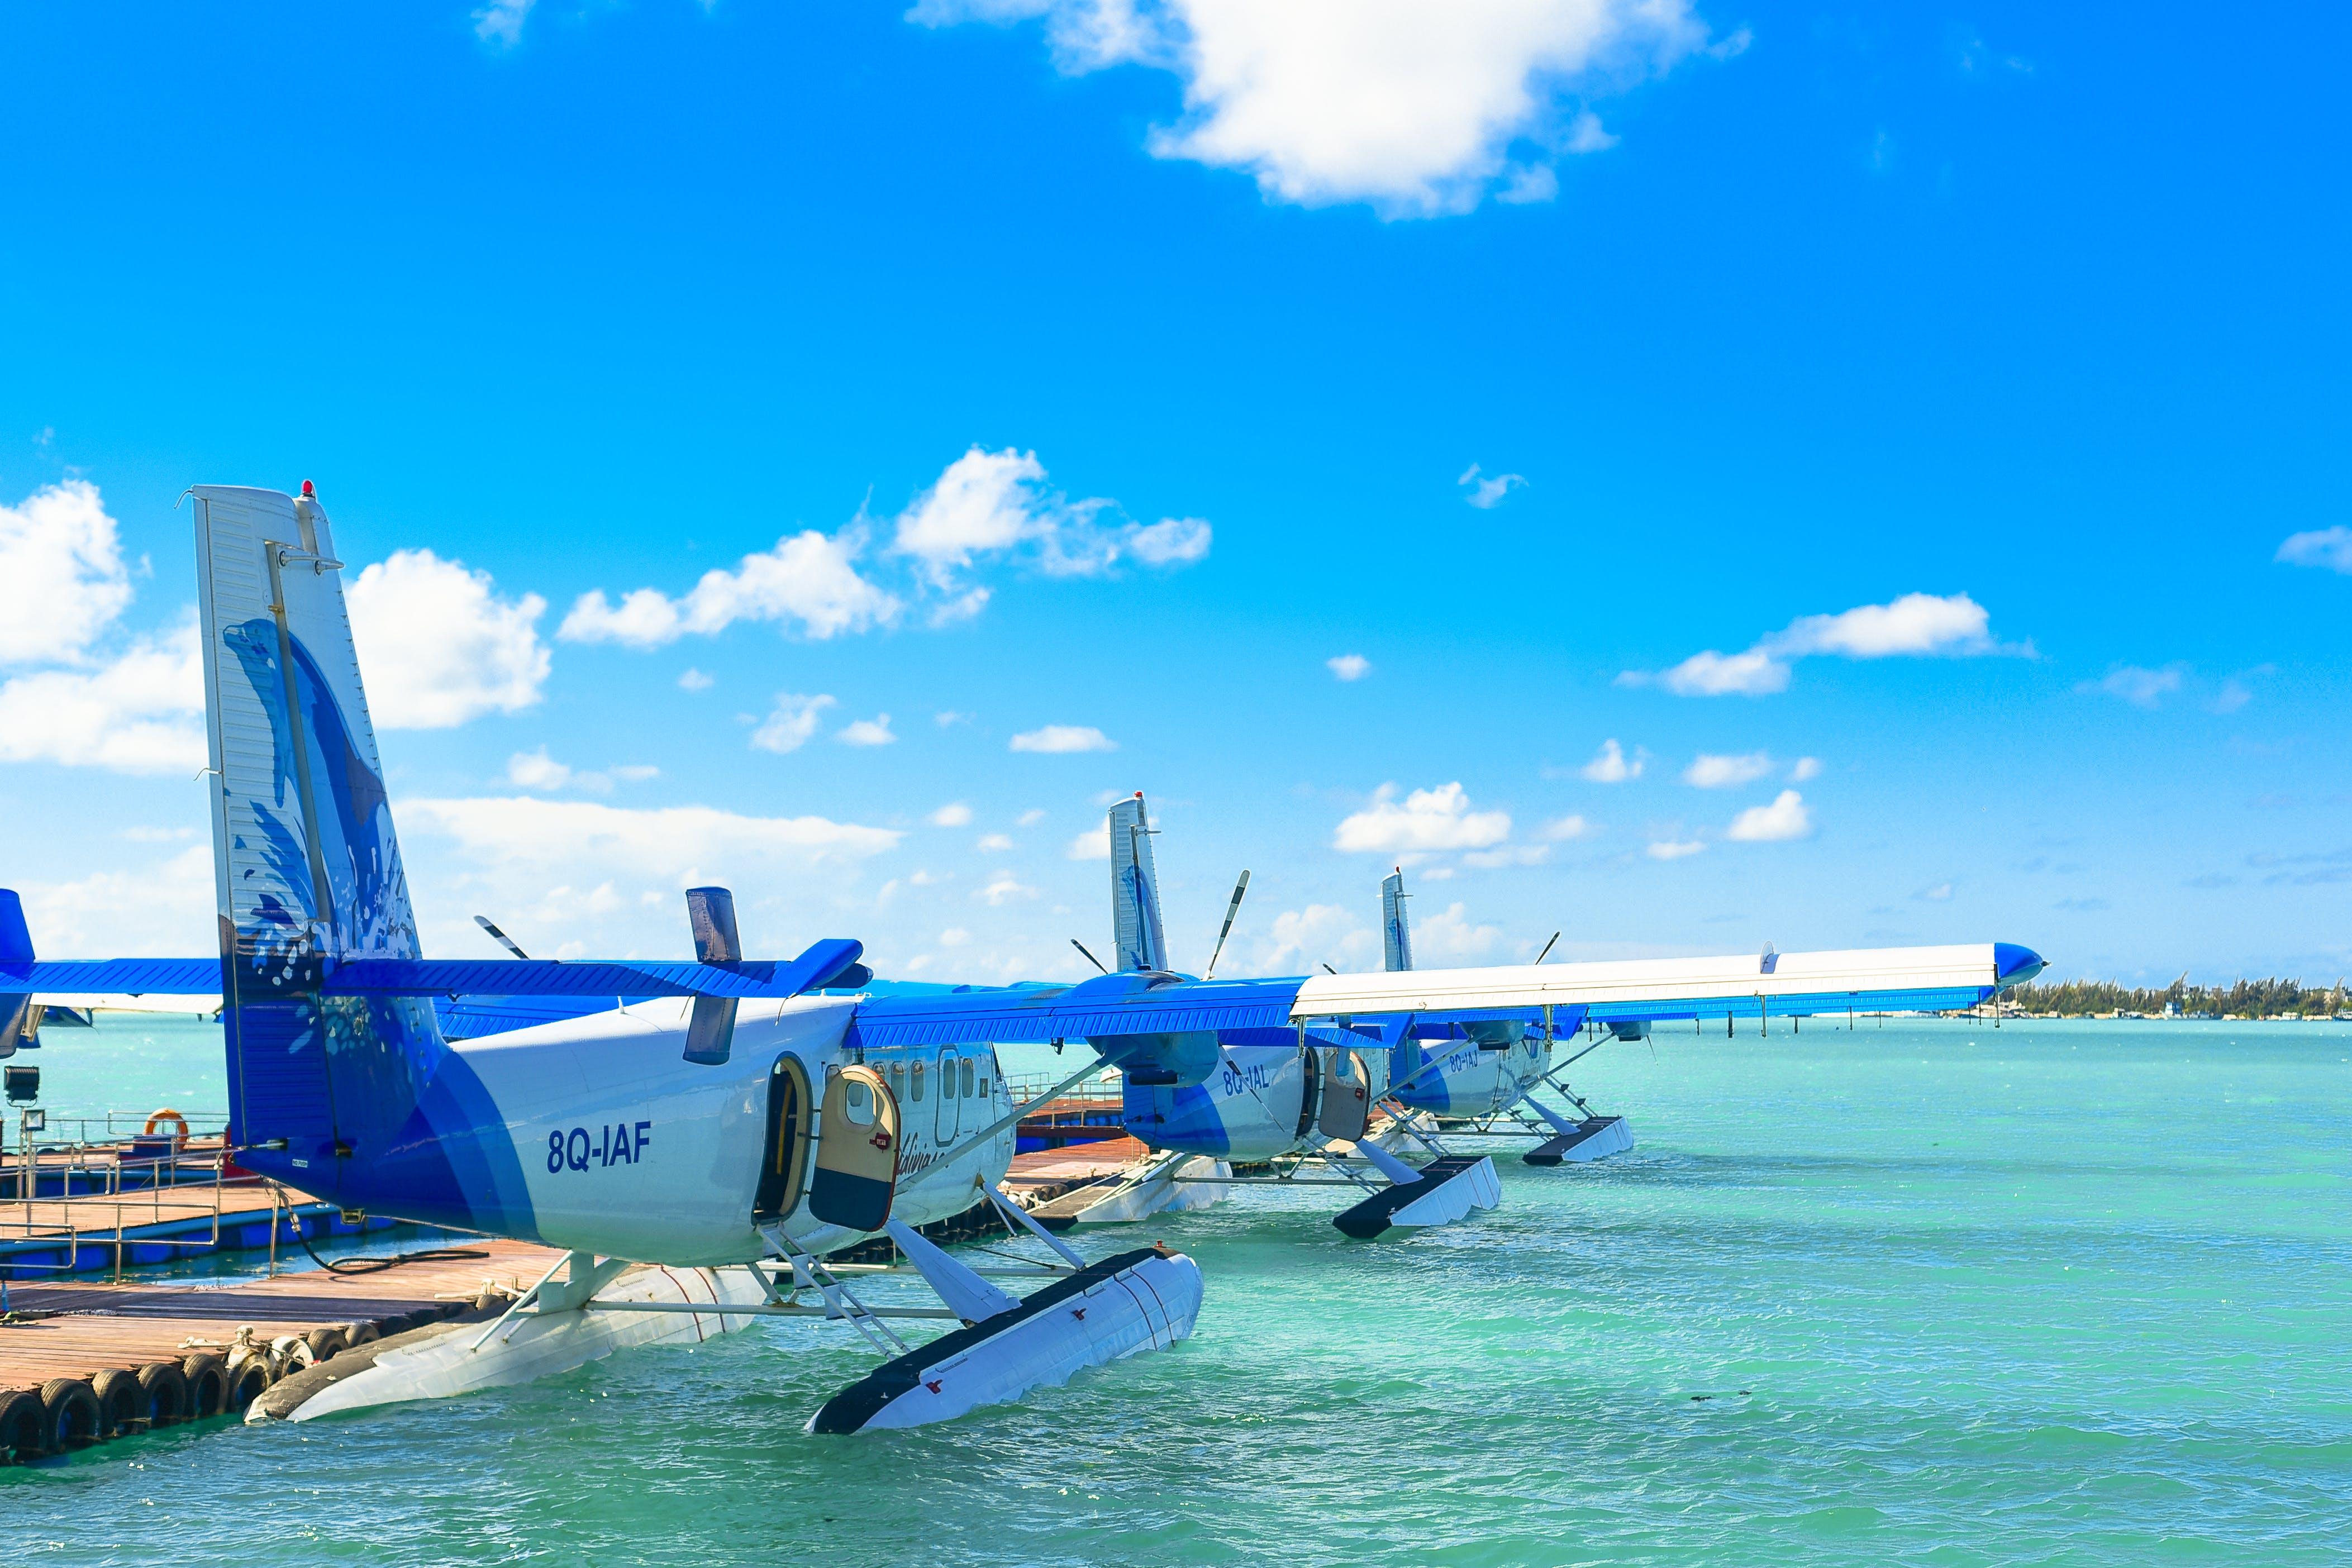 Three Blue-and-white Amphibious Planes